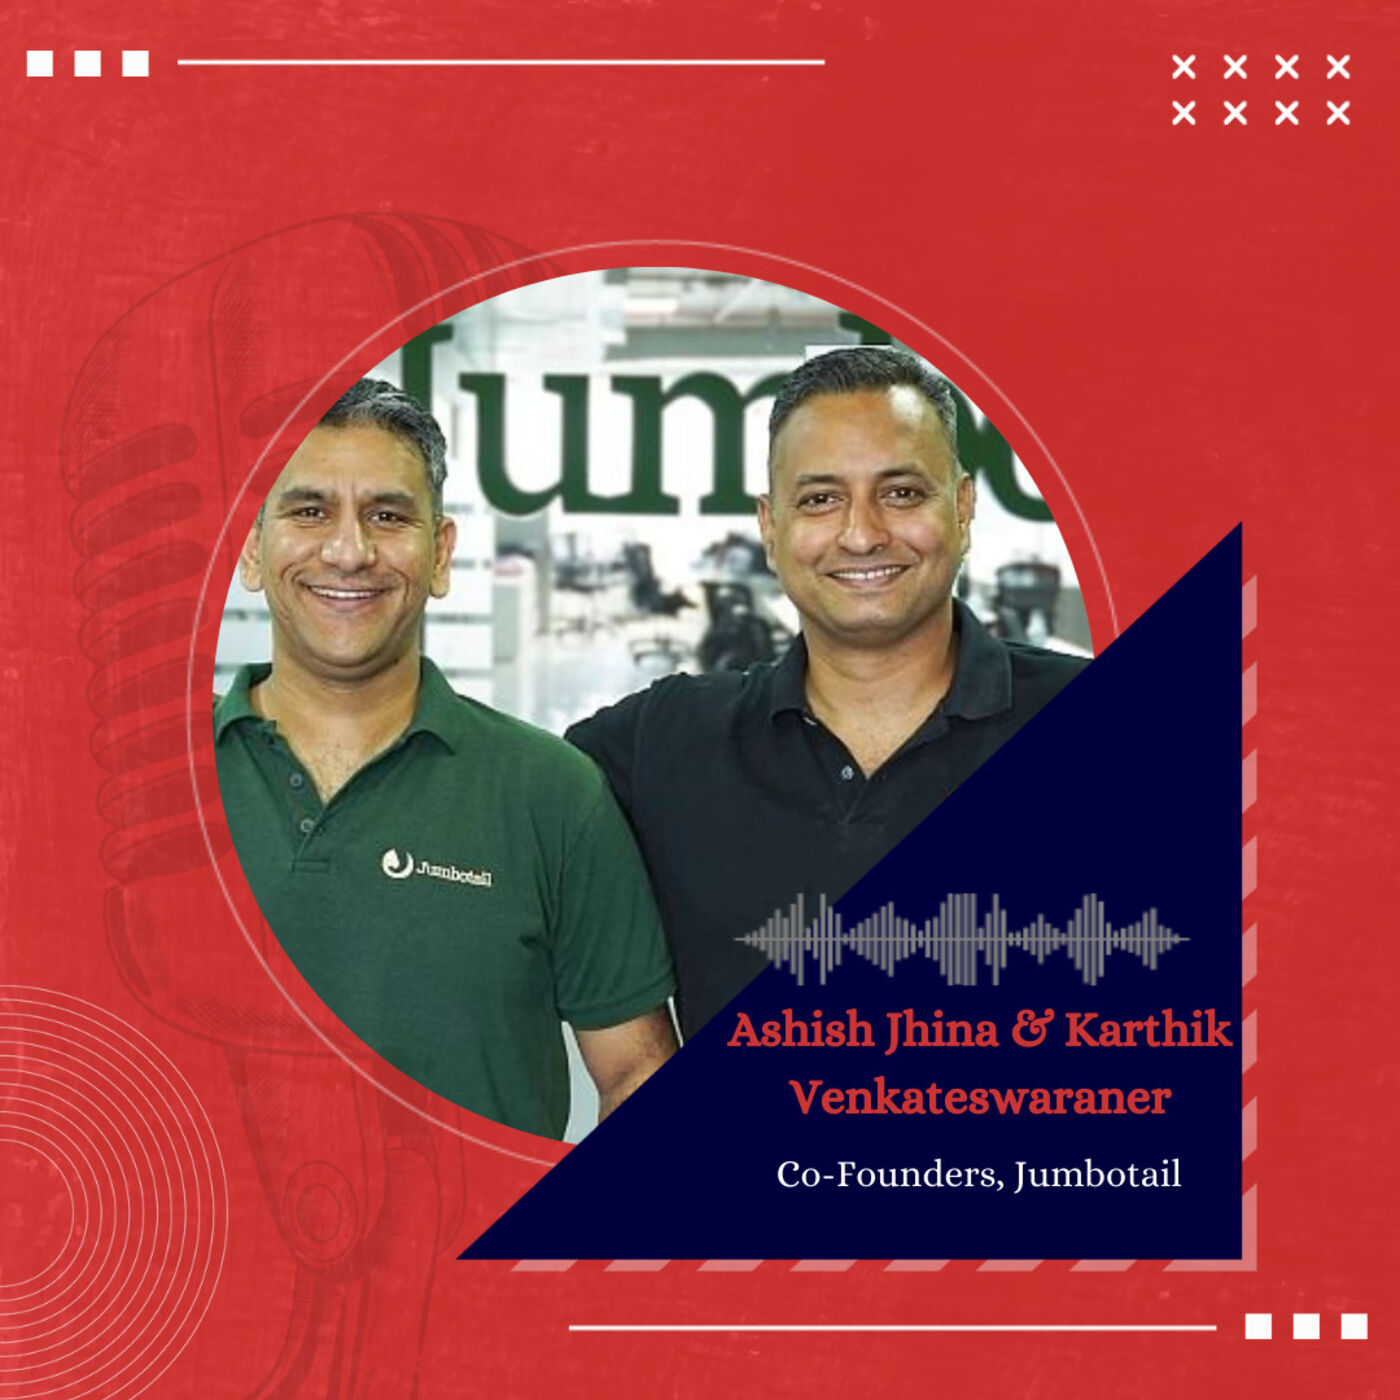 Inside the mind of Jumbotail Founders, S Karthik Venkateswaran and Ashish Jhina